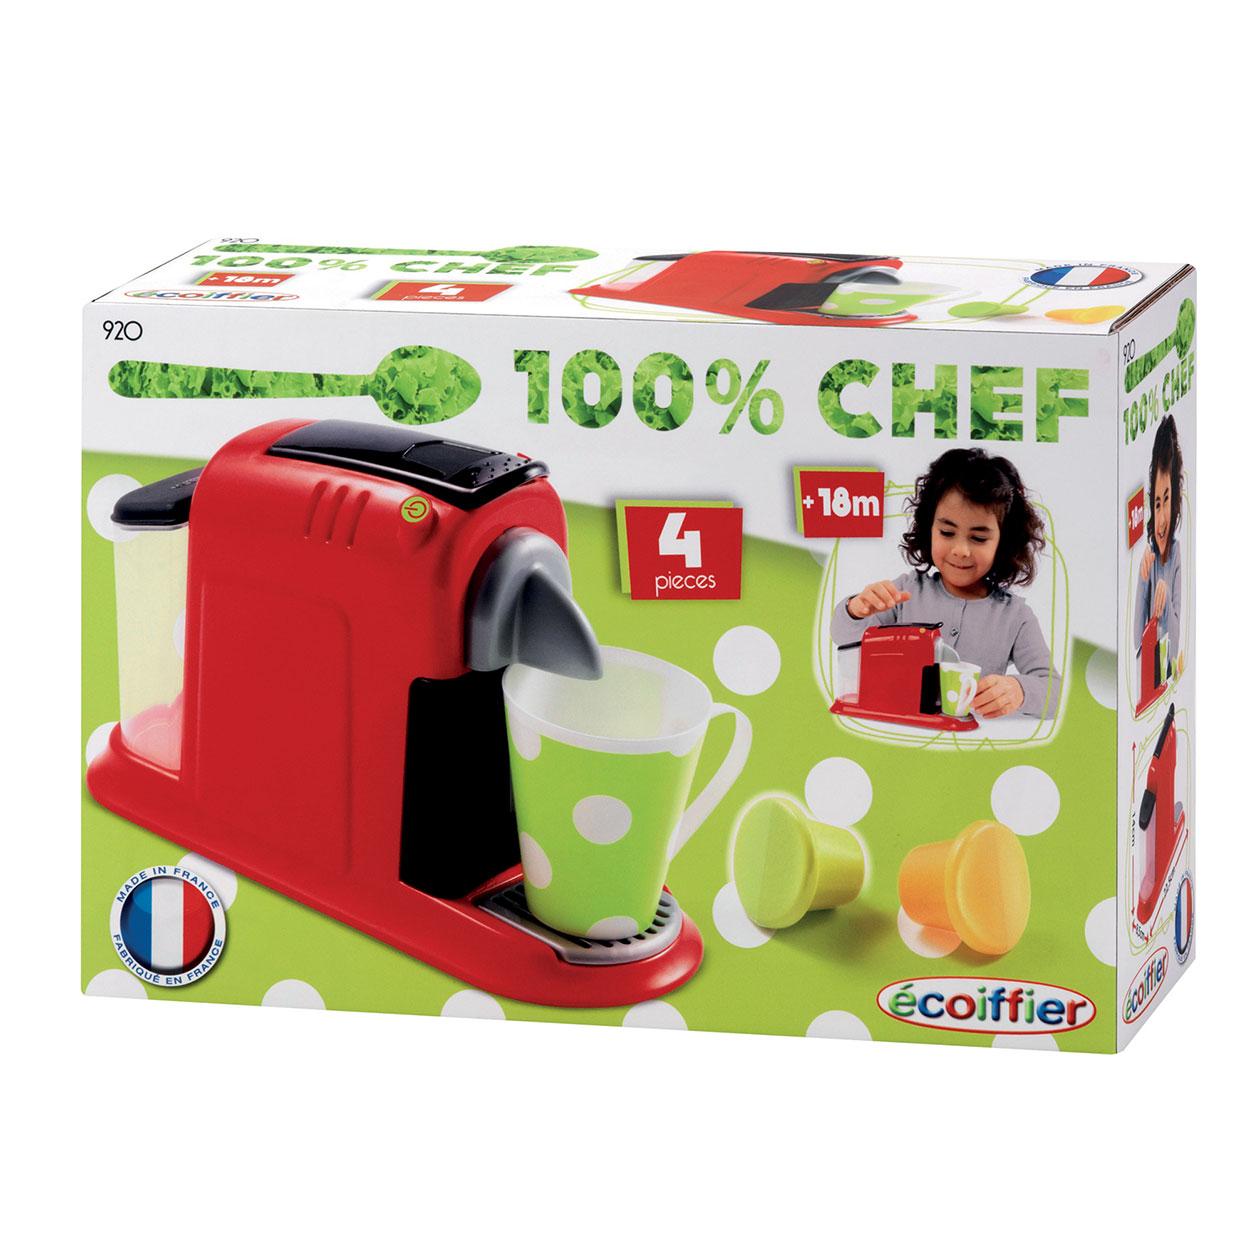 Disney Keukenaccessoires : Ecoiffier 100% Chef Koffiemachine online kopen Lobbes nl